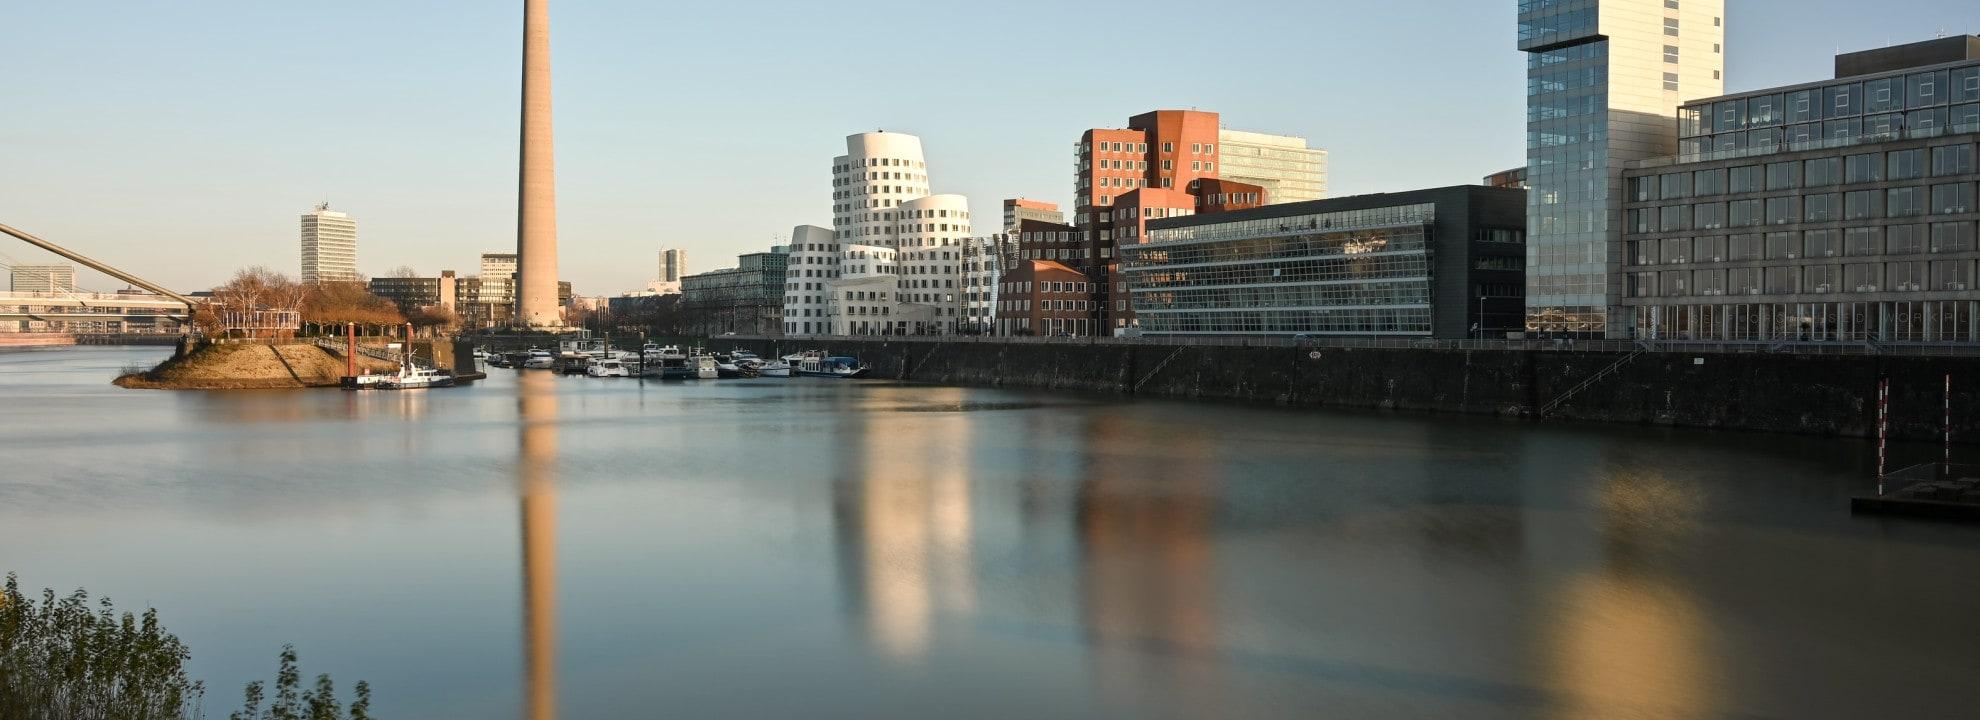 Laravel Agentur Düsseldorf